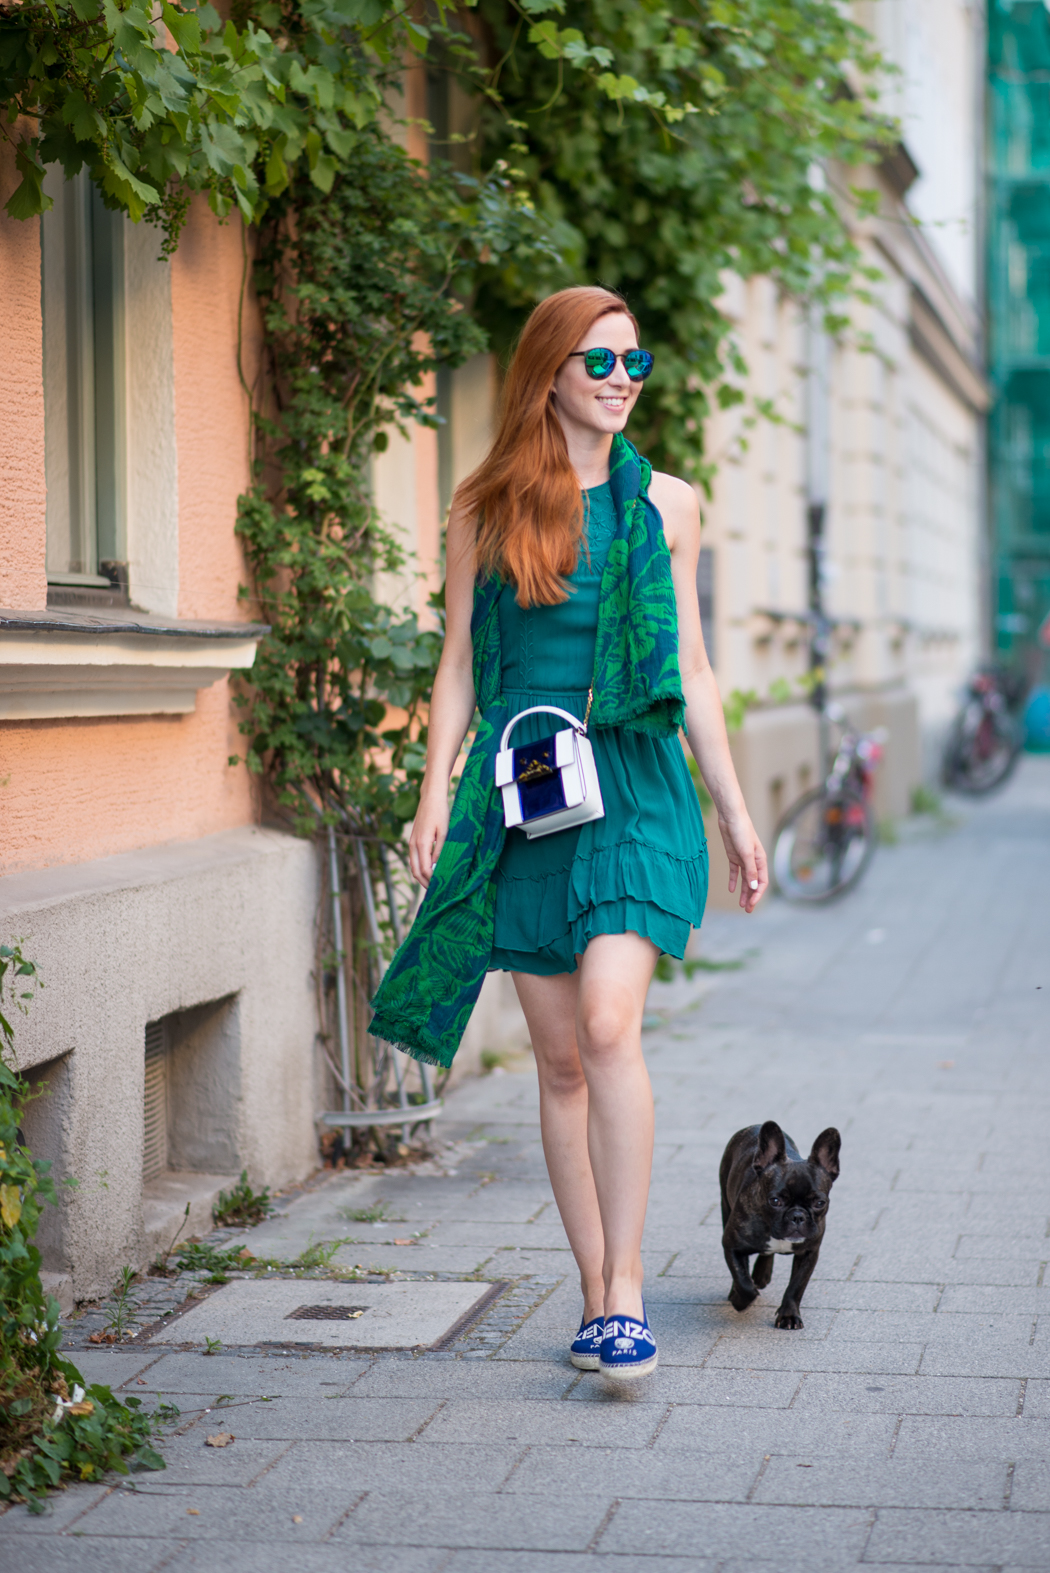 Fashionblog-Fashionblogger-Fashion-Blog-Lifestyle-München-Deutschland-Lindarella-Linda-Rella-2